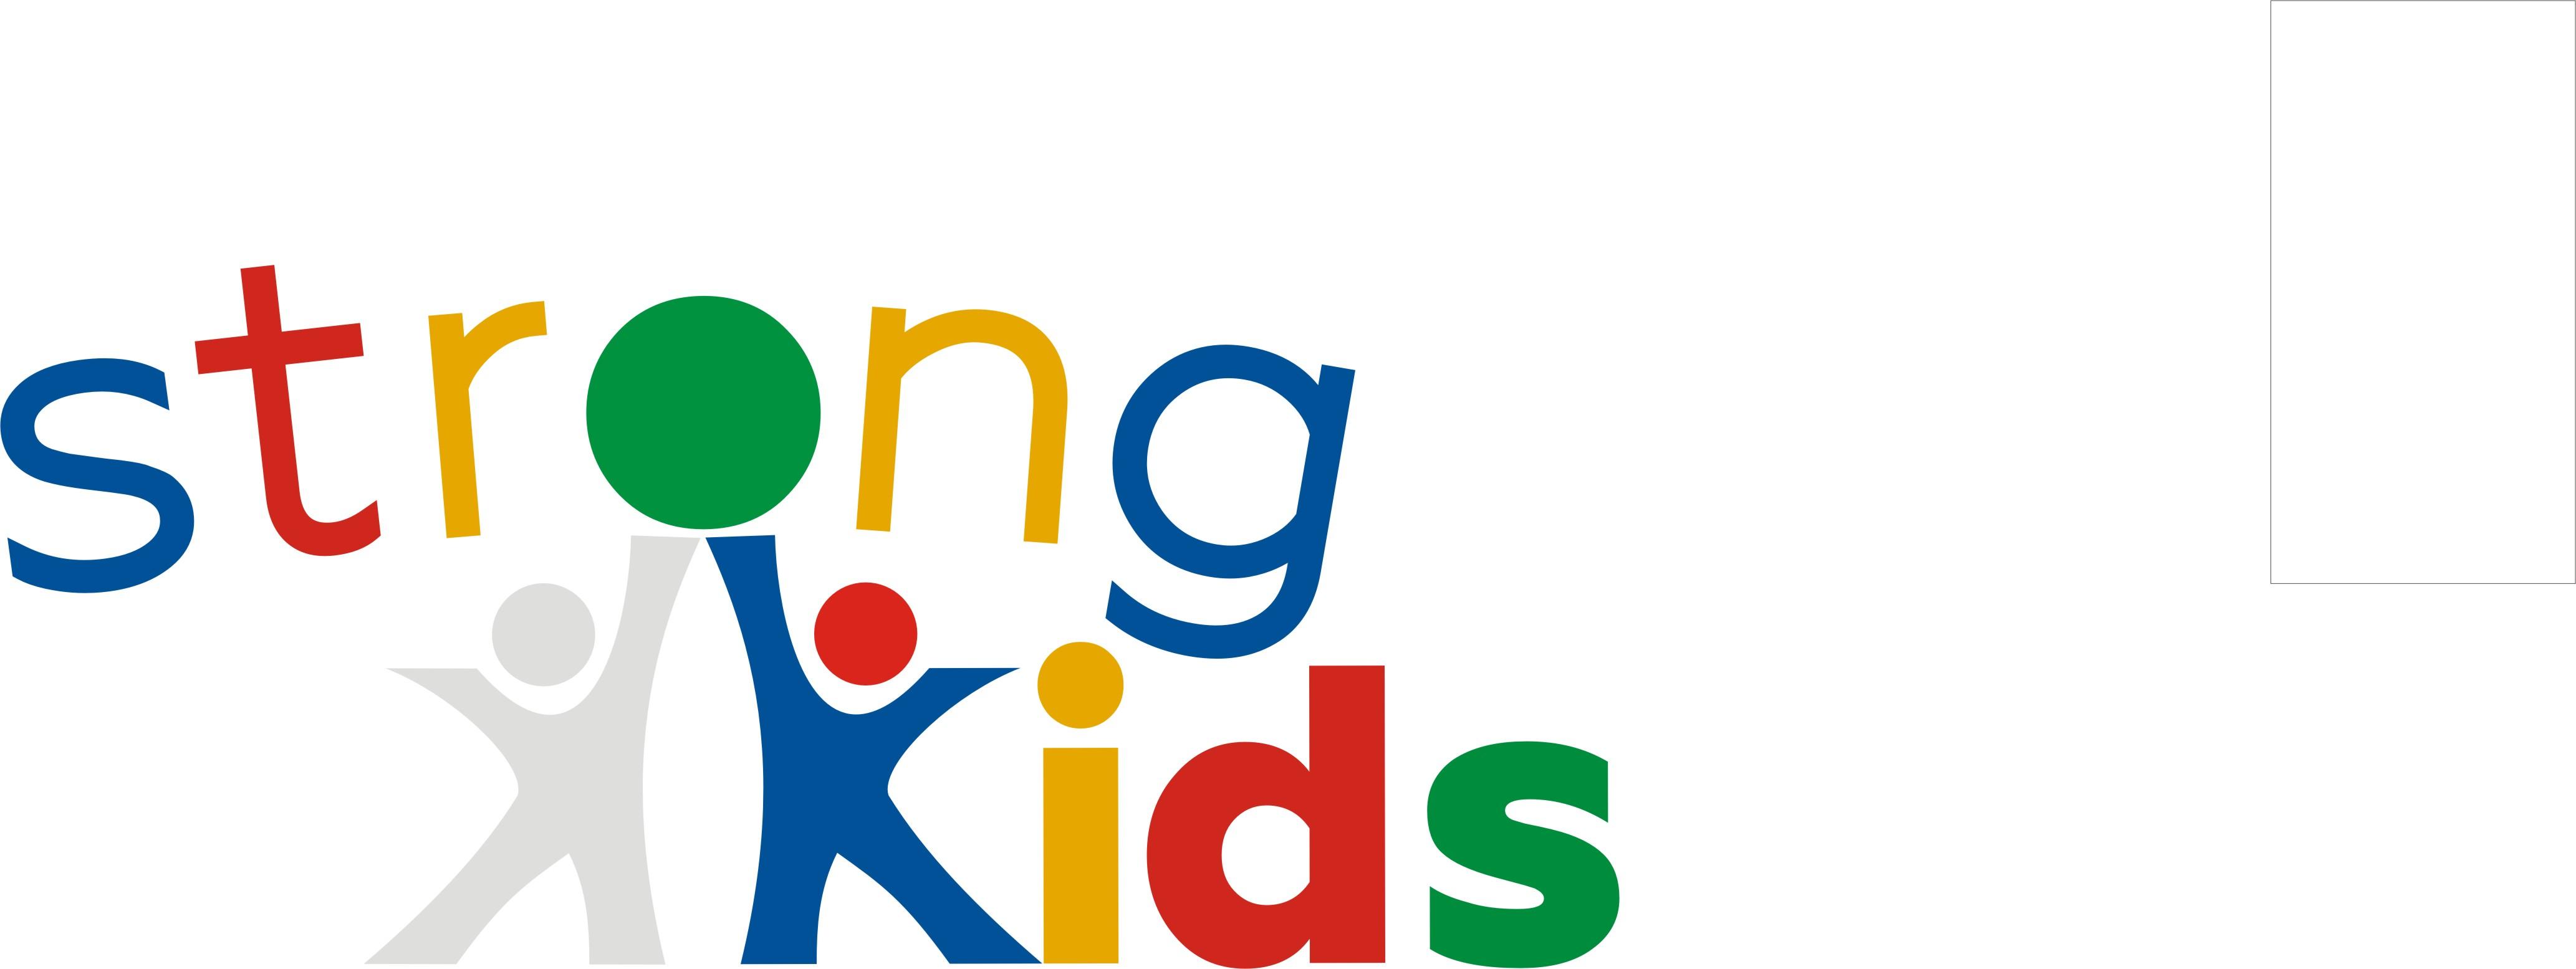 Логотип для Детского Интернет Магазина StrongKids фото f_3825c8912f27971e.jpg